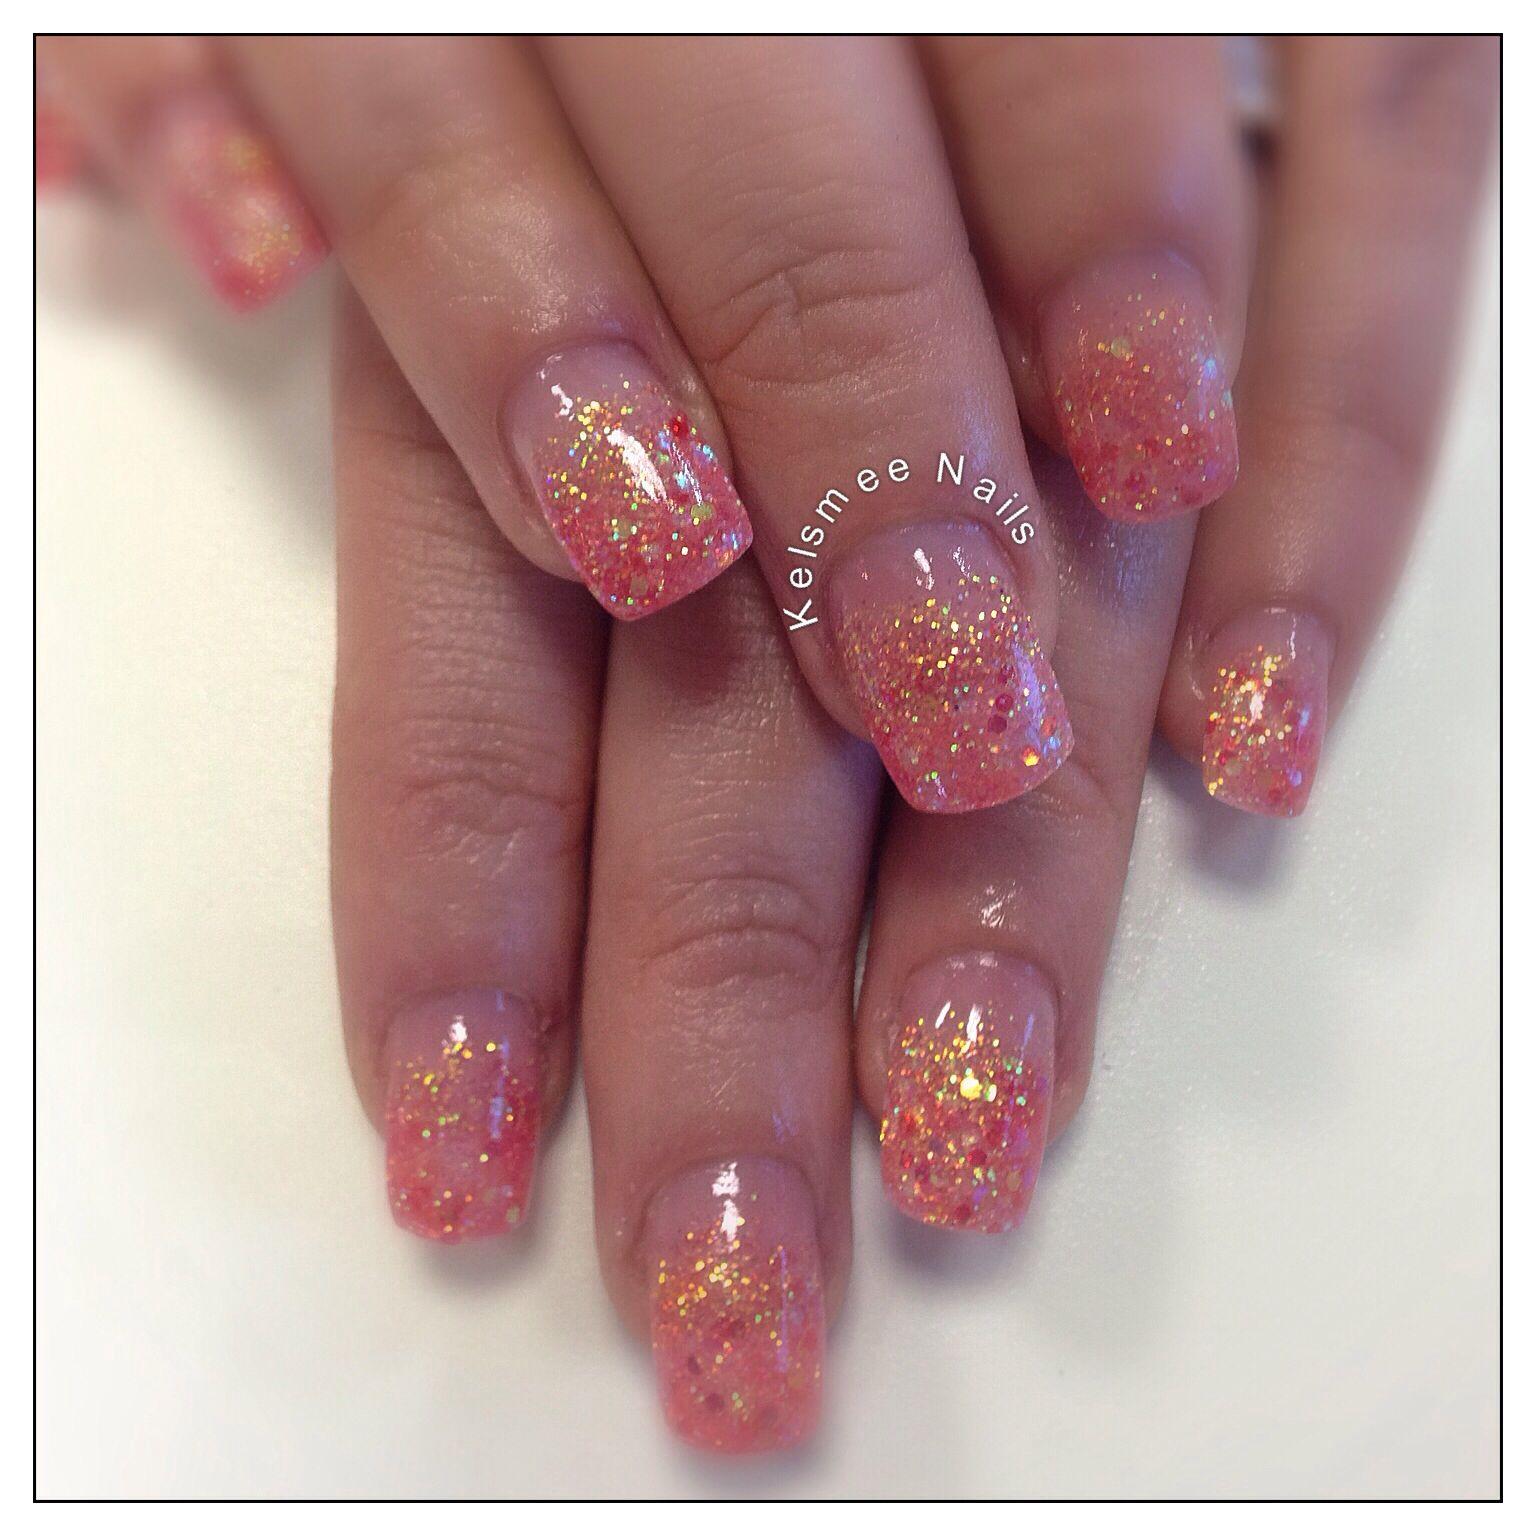 Young Nails acrylic glitternails | Re-Pin Nail Exchange | Pinterest ...